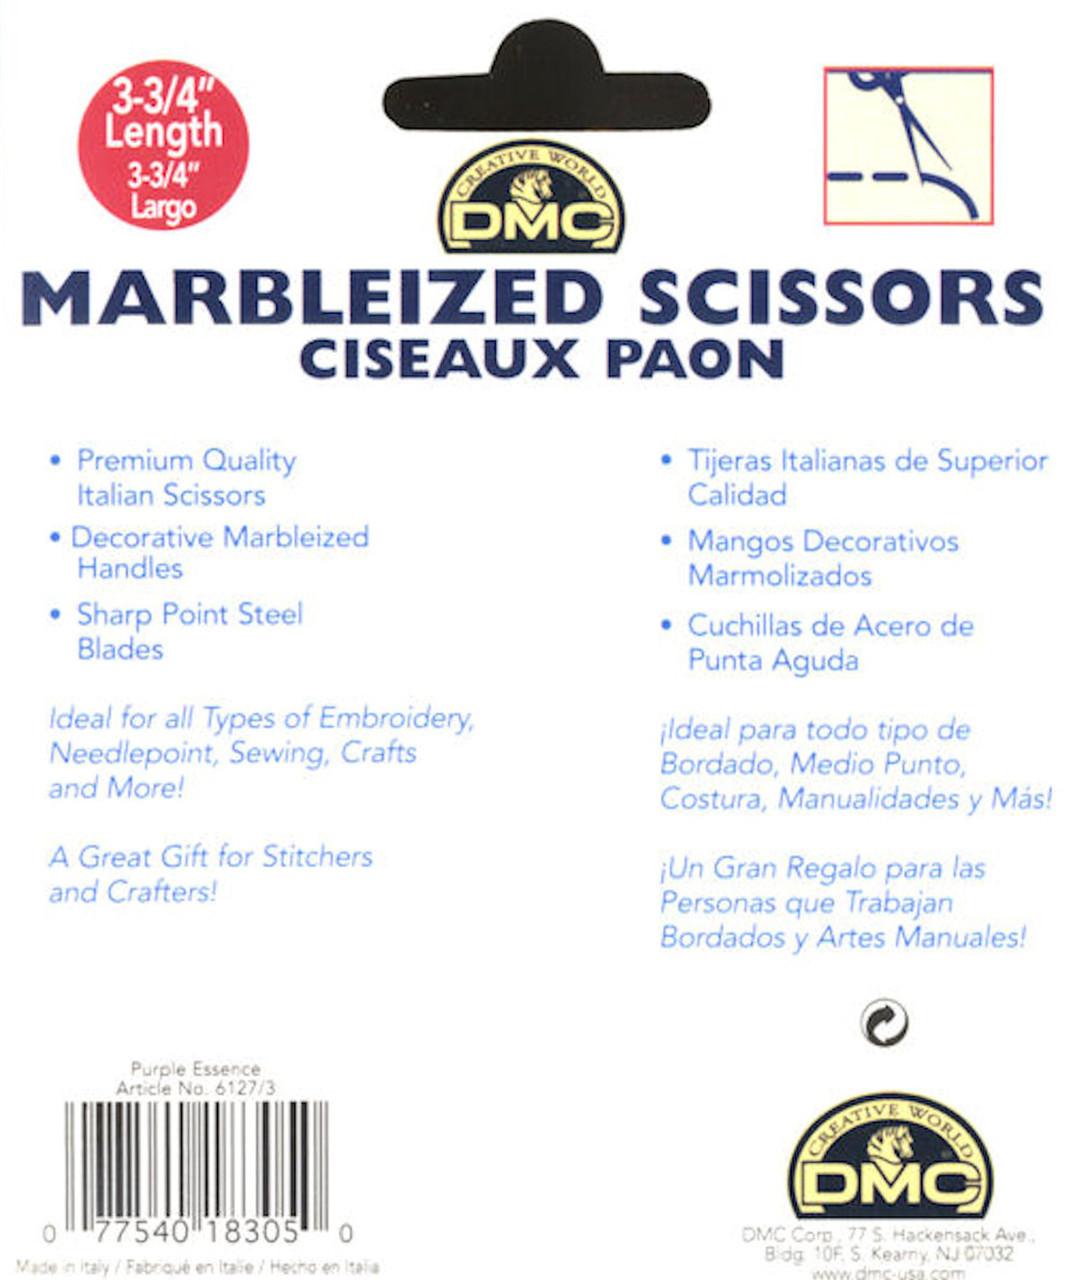 DMC - Purple Essence Marbleized Scissors